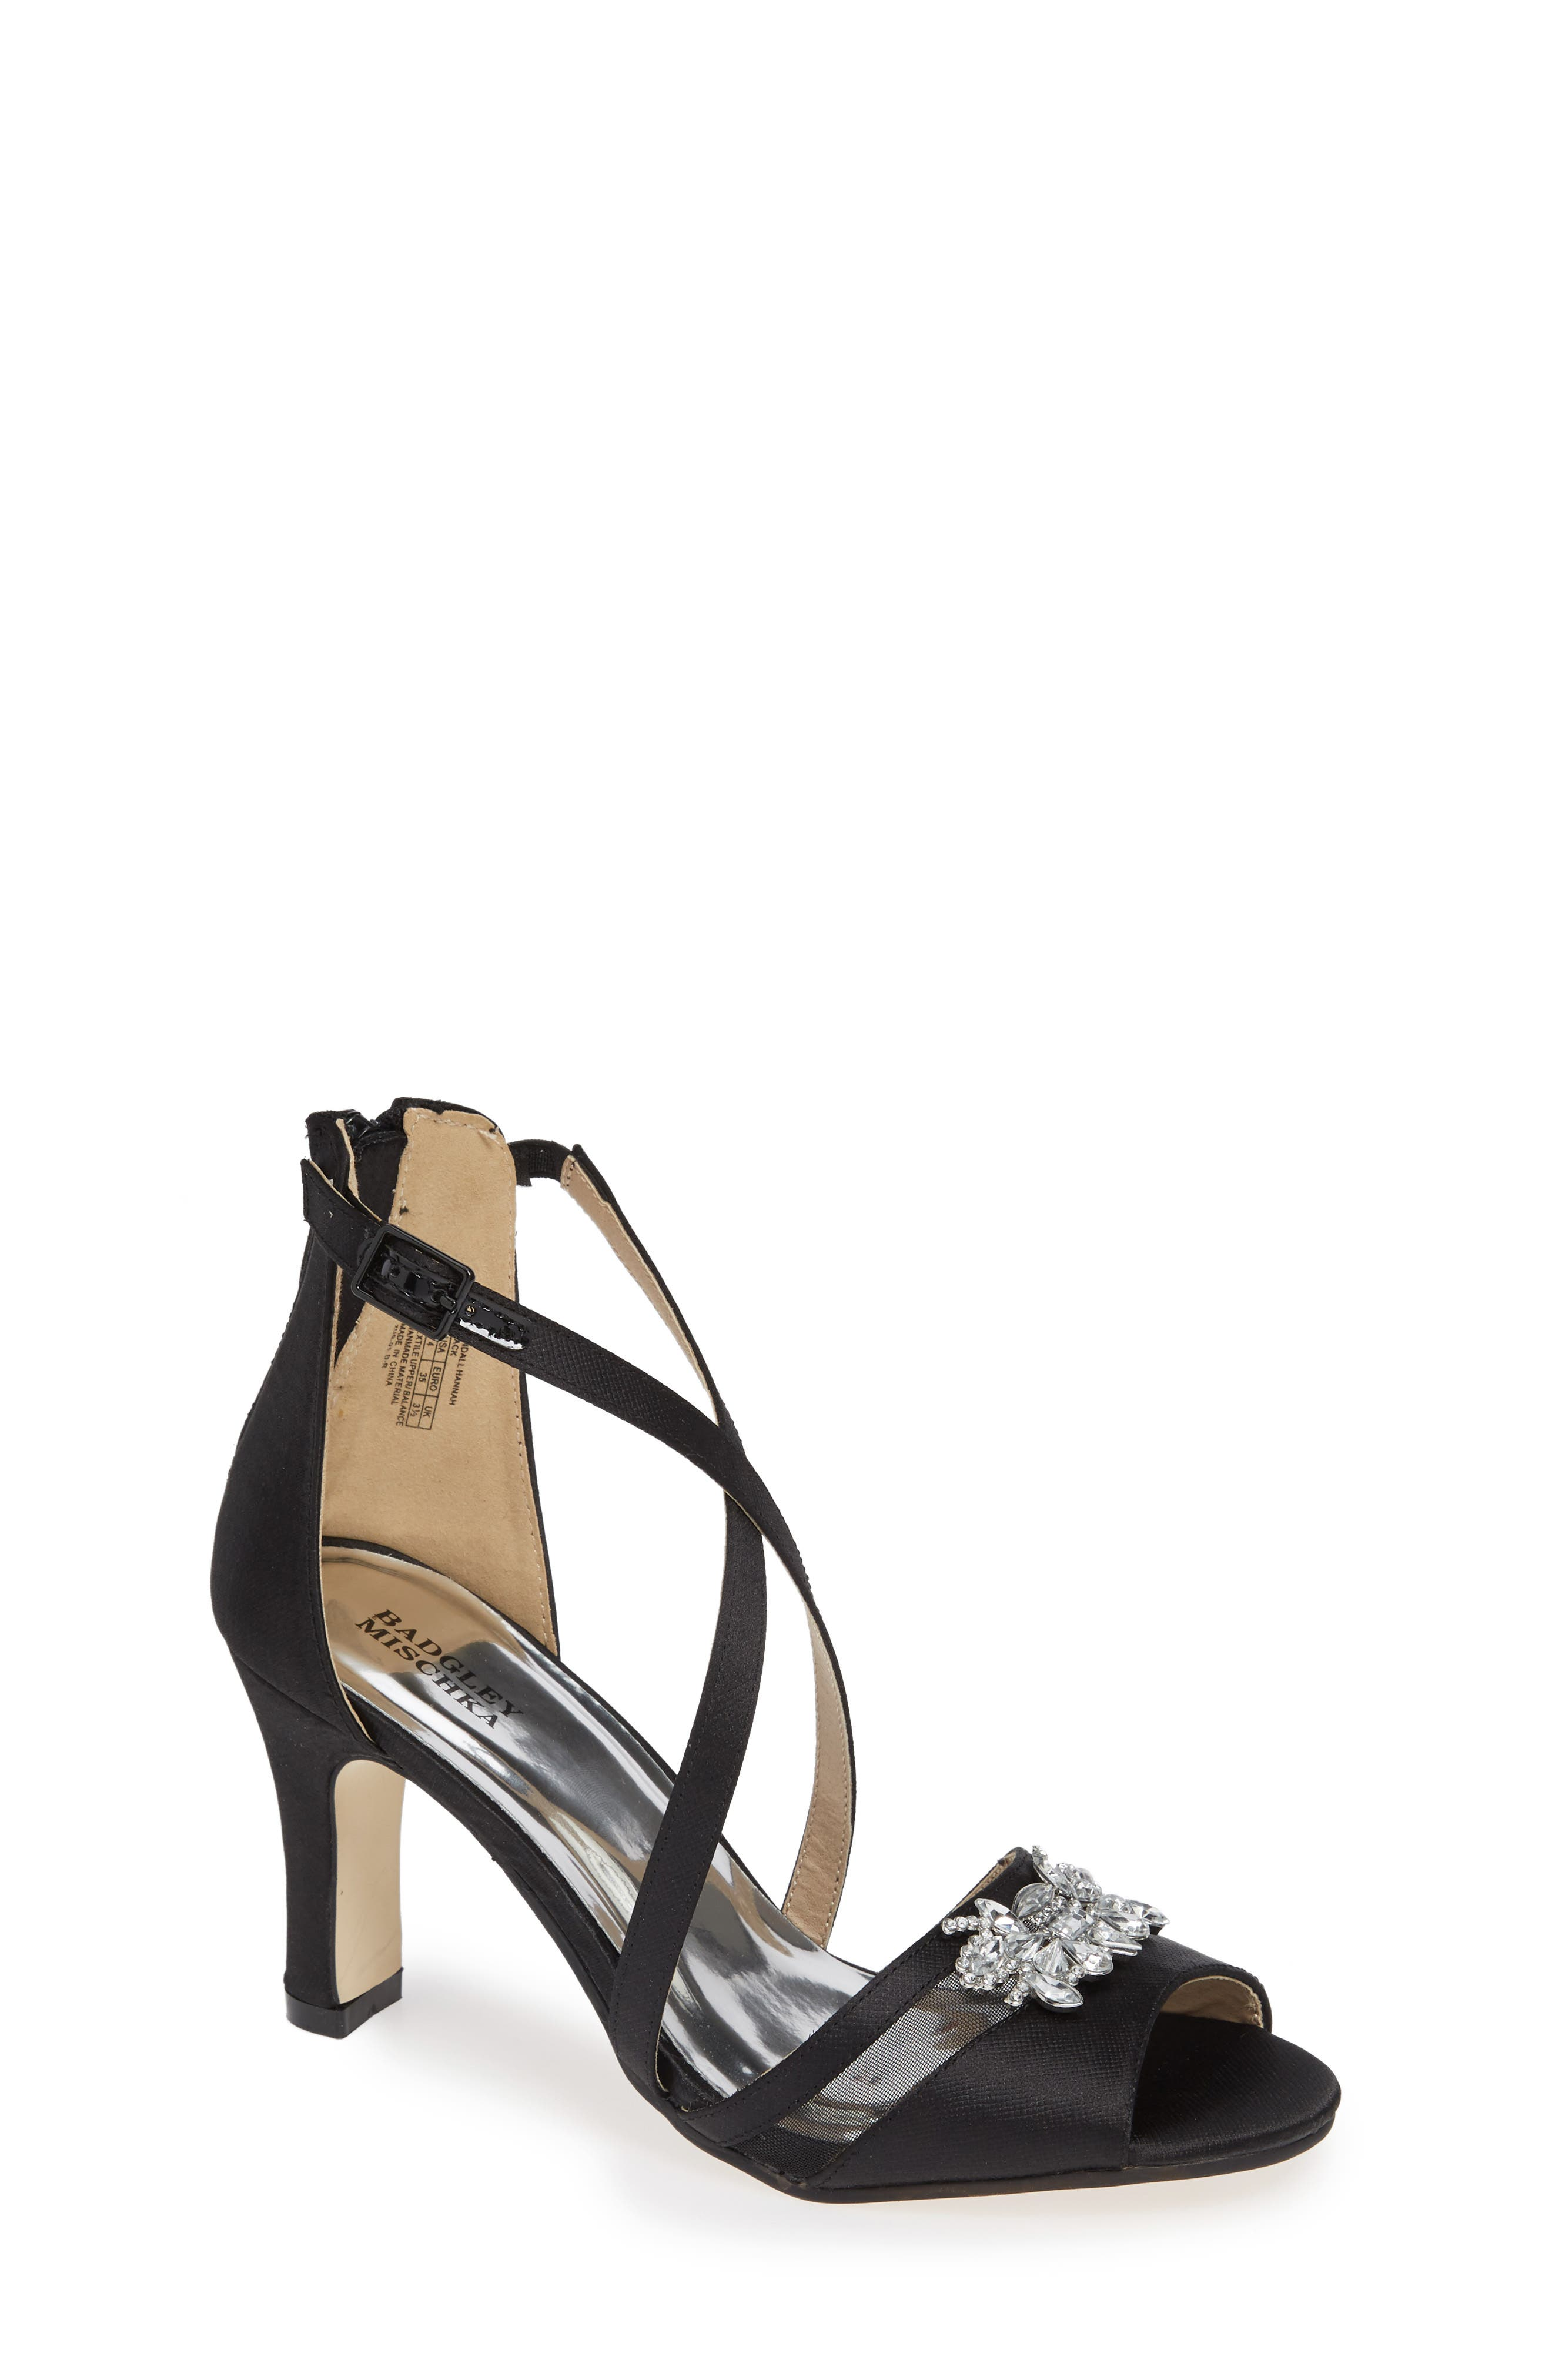 Badgley Mischka Kandall Hannah Embellished Cross Strap Sandal, Main, color, BLACK SATIN